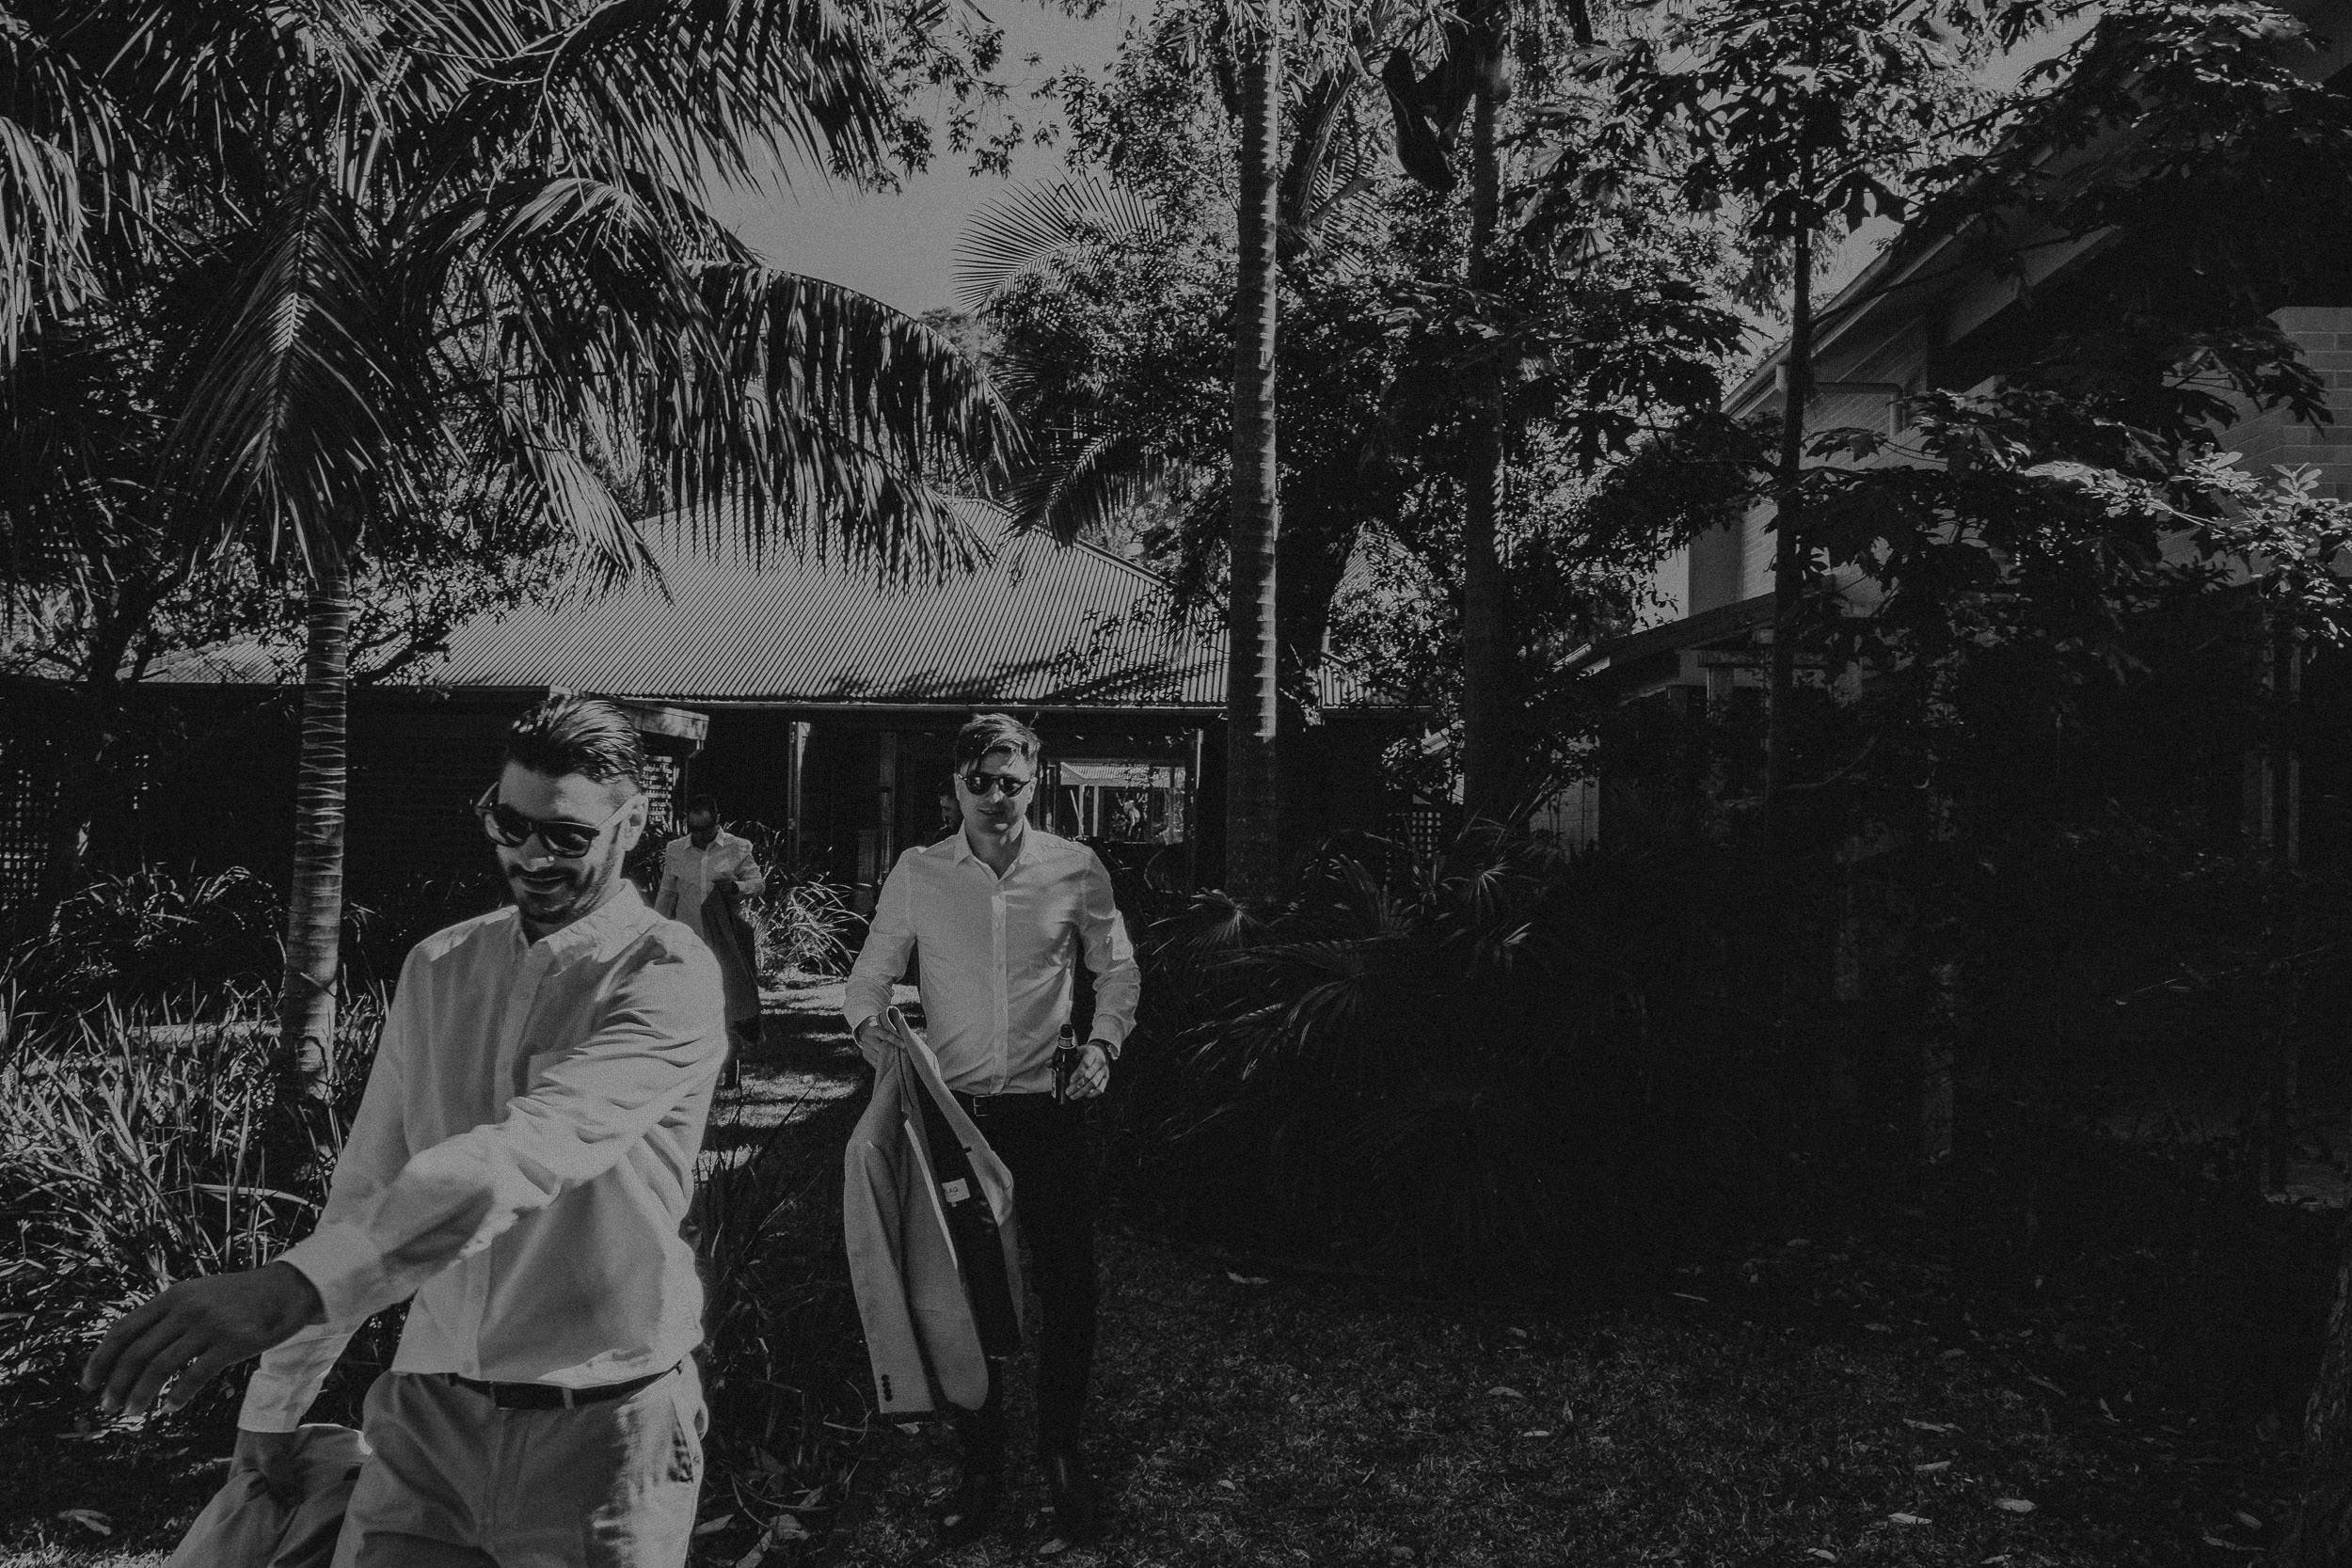 S&A Elopement - Kings & Thieves - Shred 'Til Dead - Central Coast Beach Forest Wedding - 32.jpg